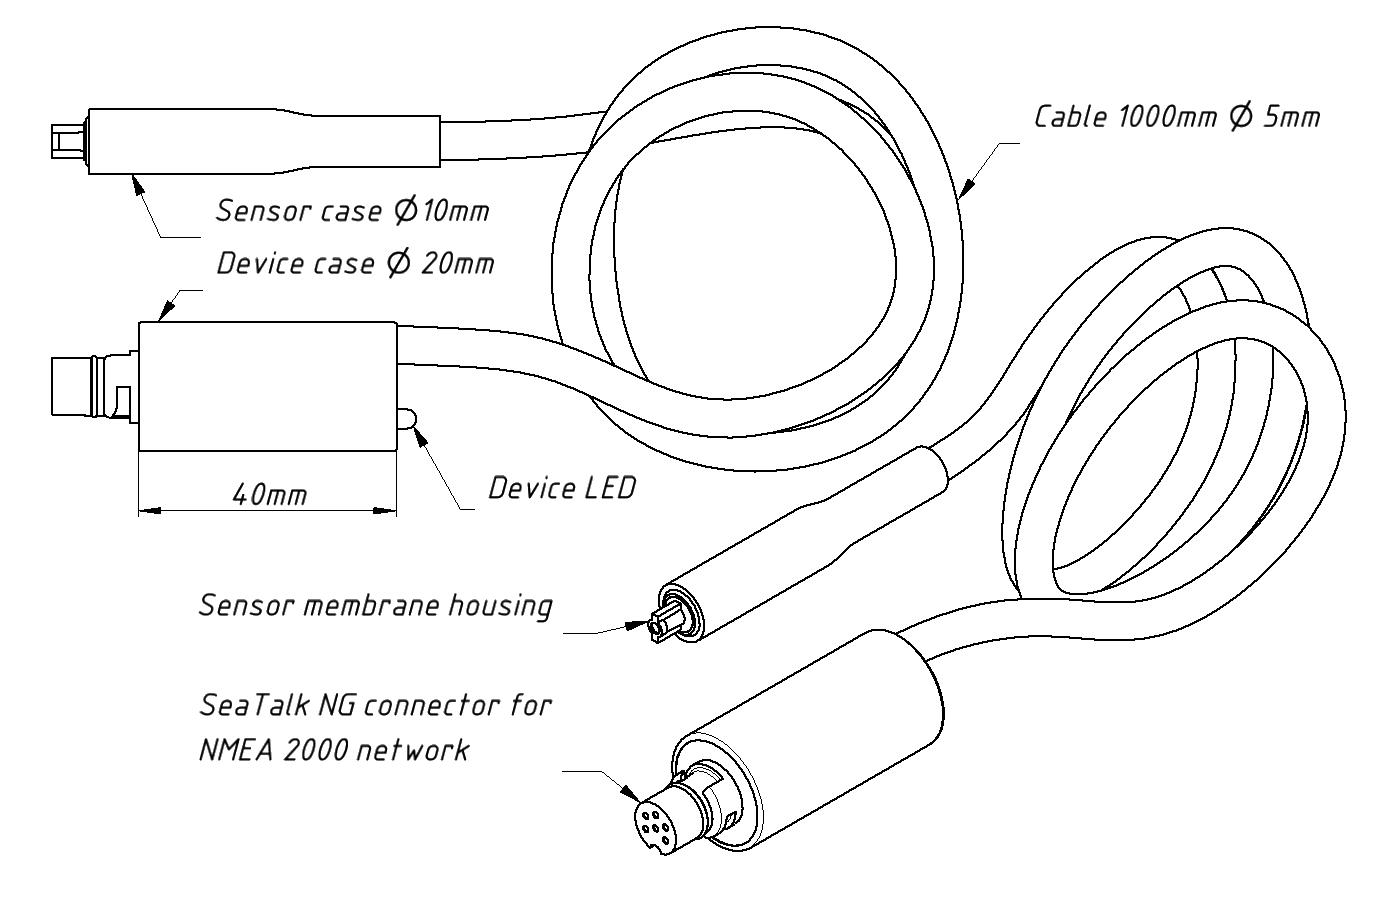 Drawing of YDHS-01R model of Humidity Sensor